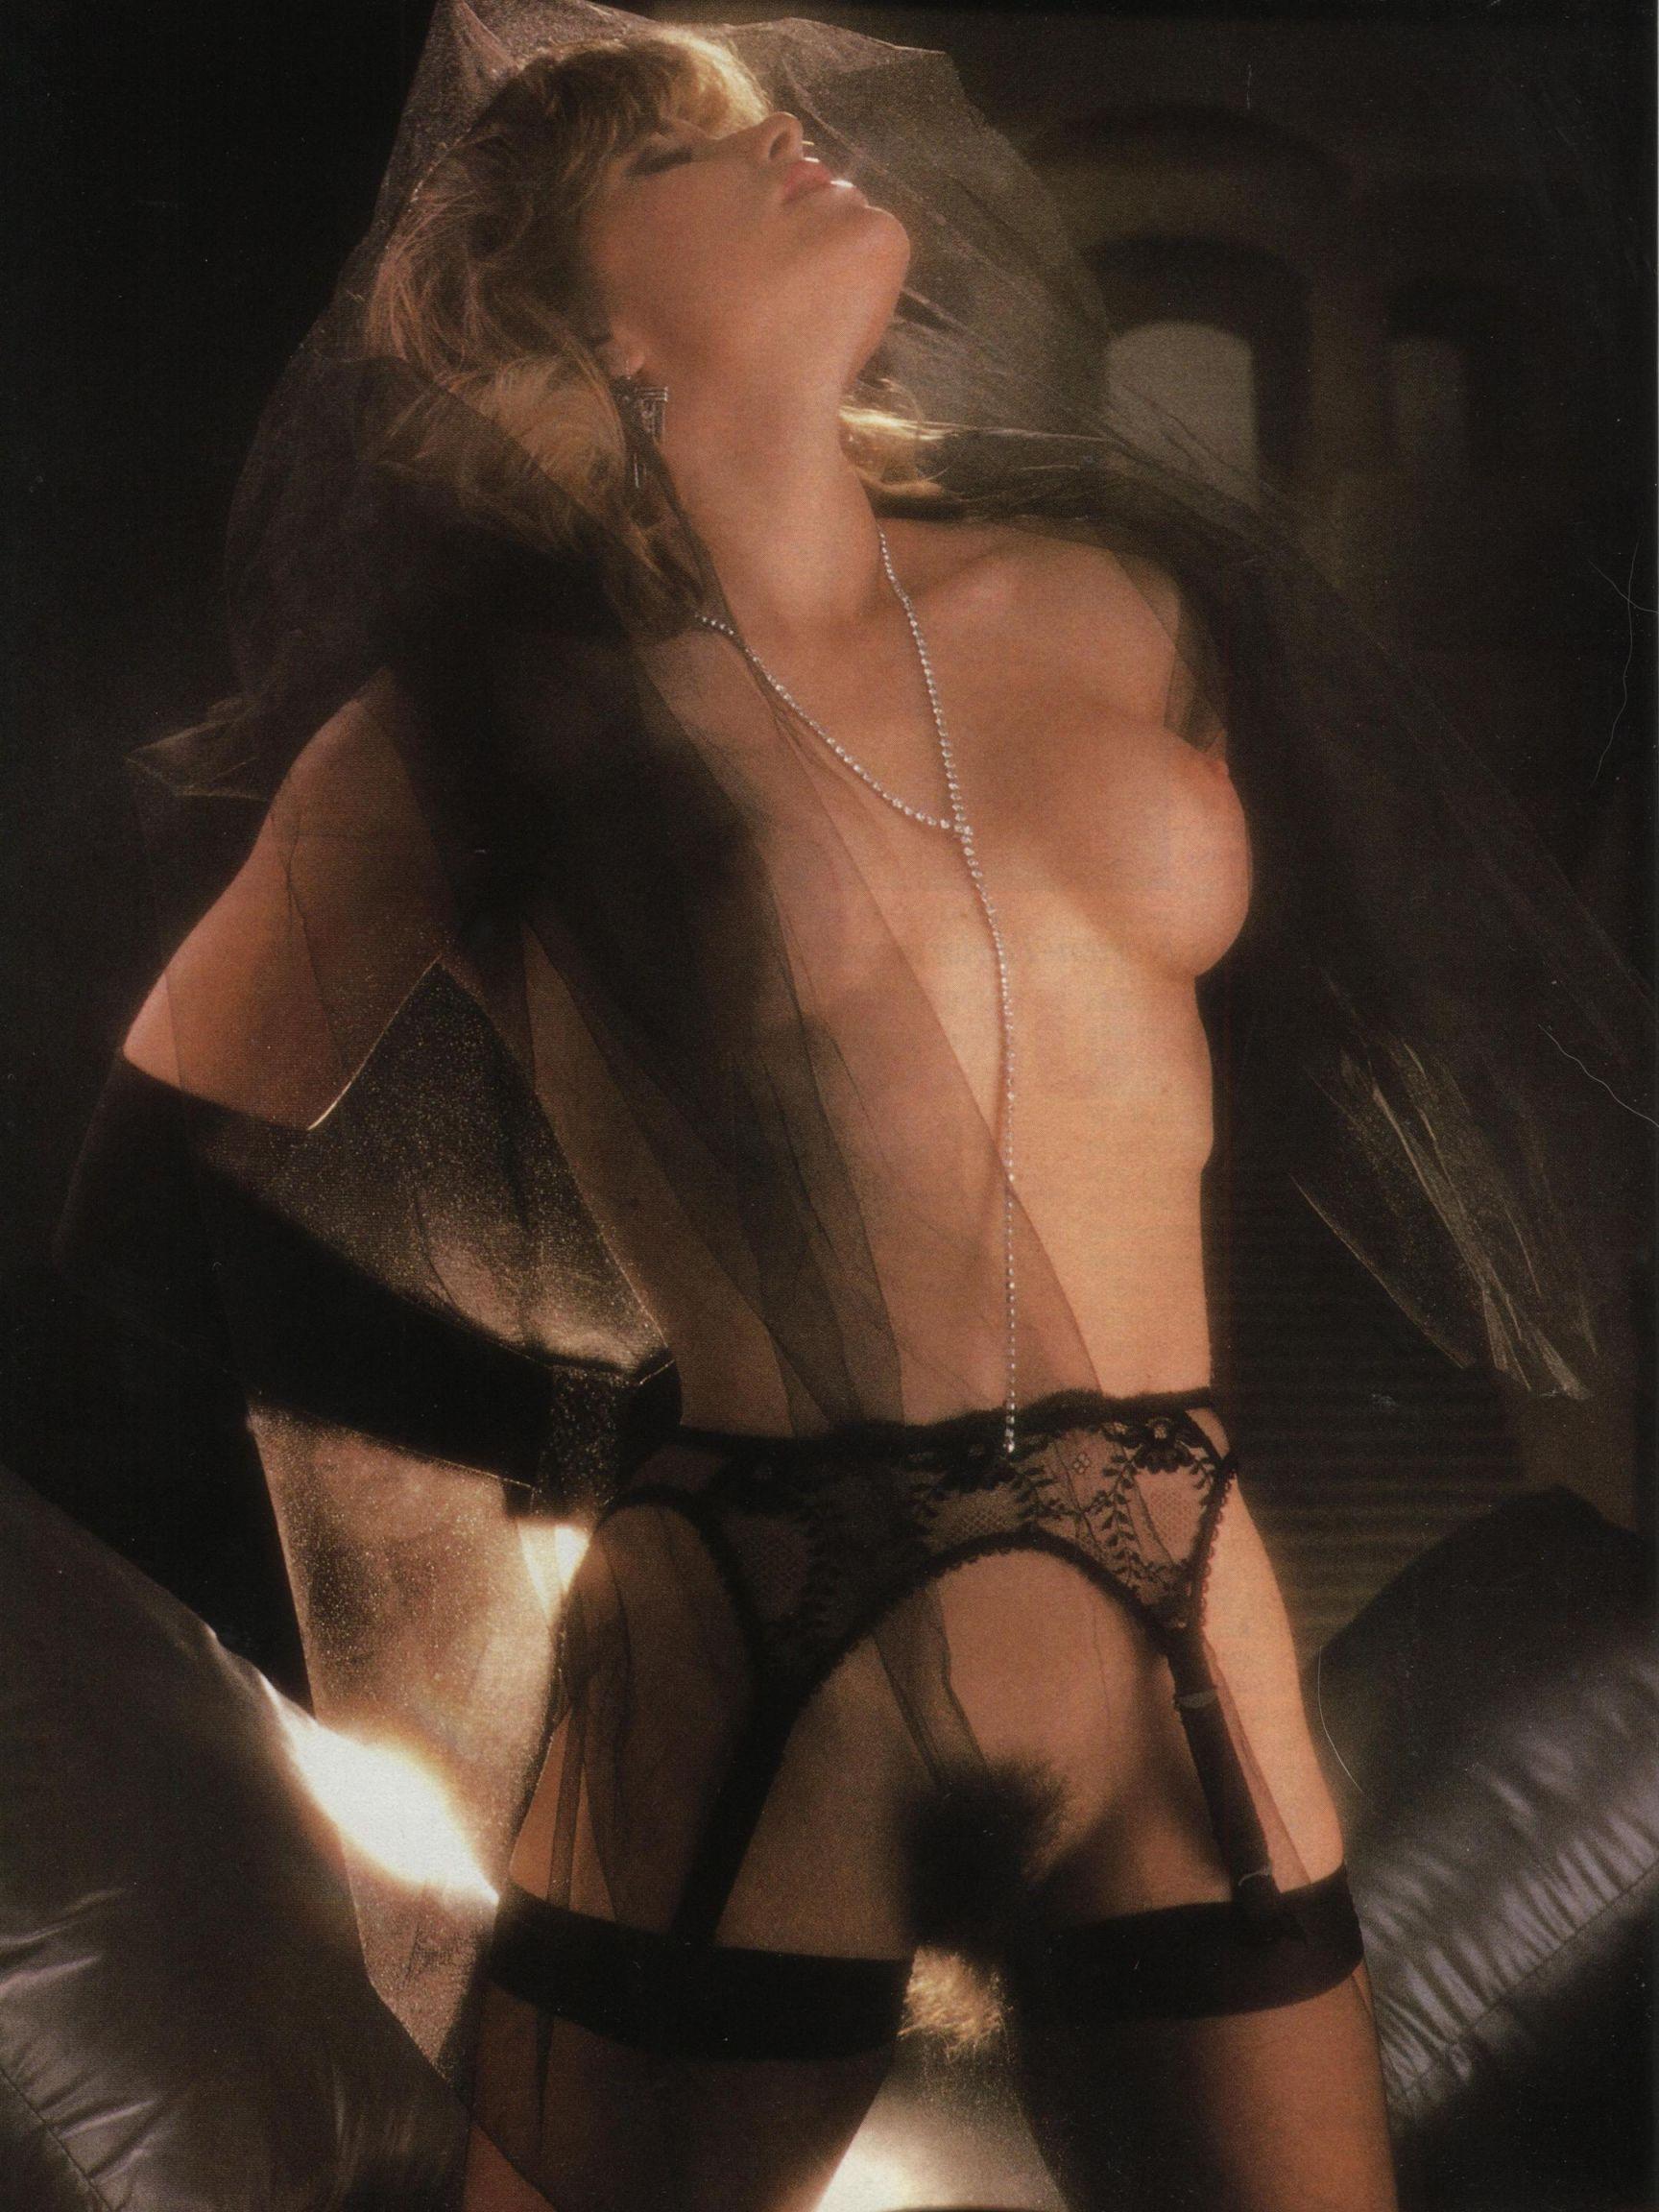 judy norton taylor playboy pics 1985